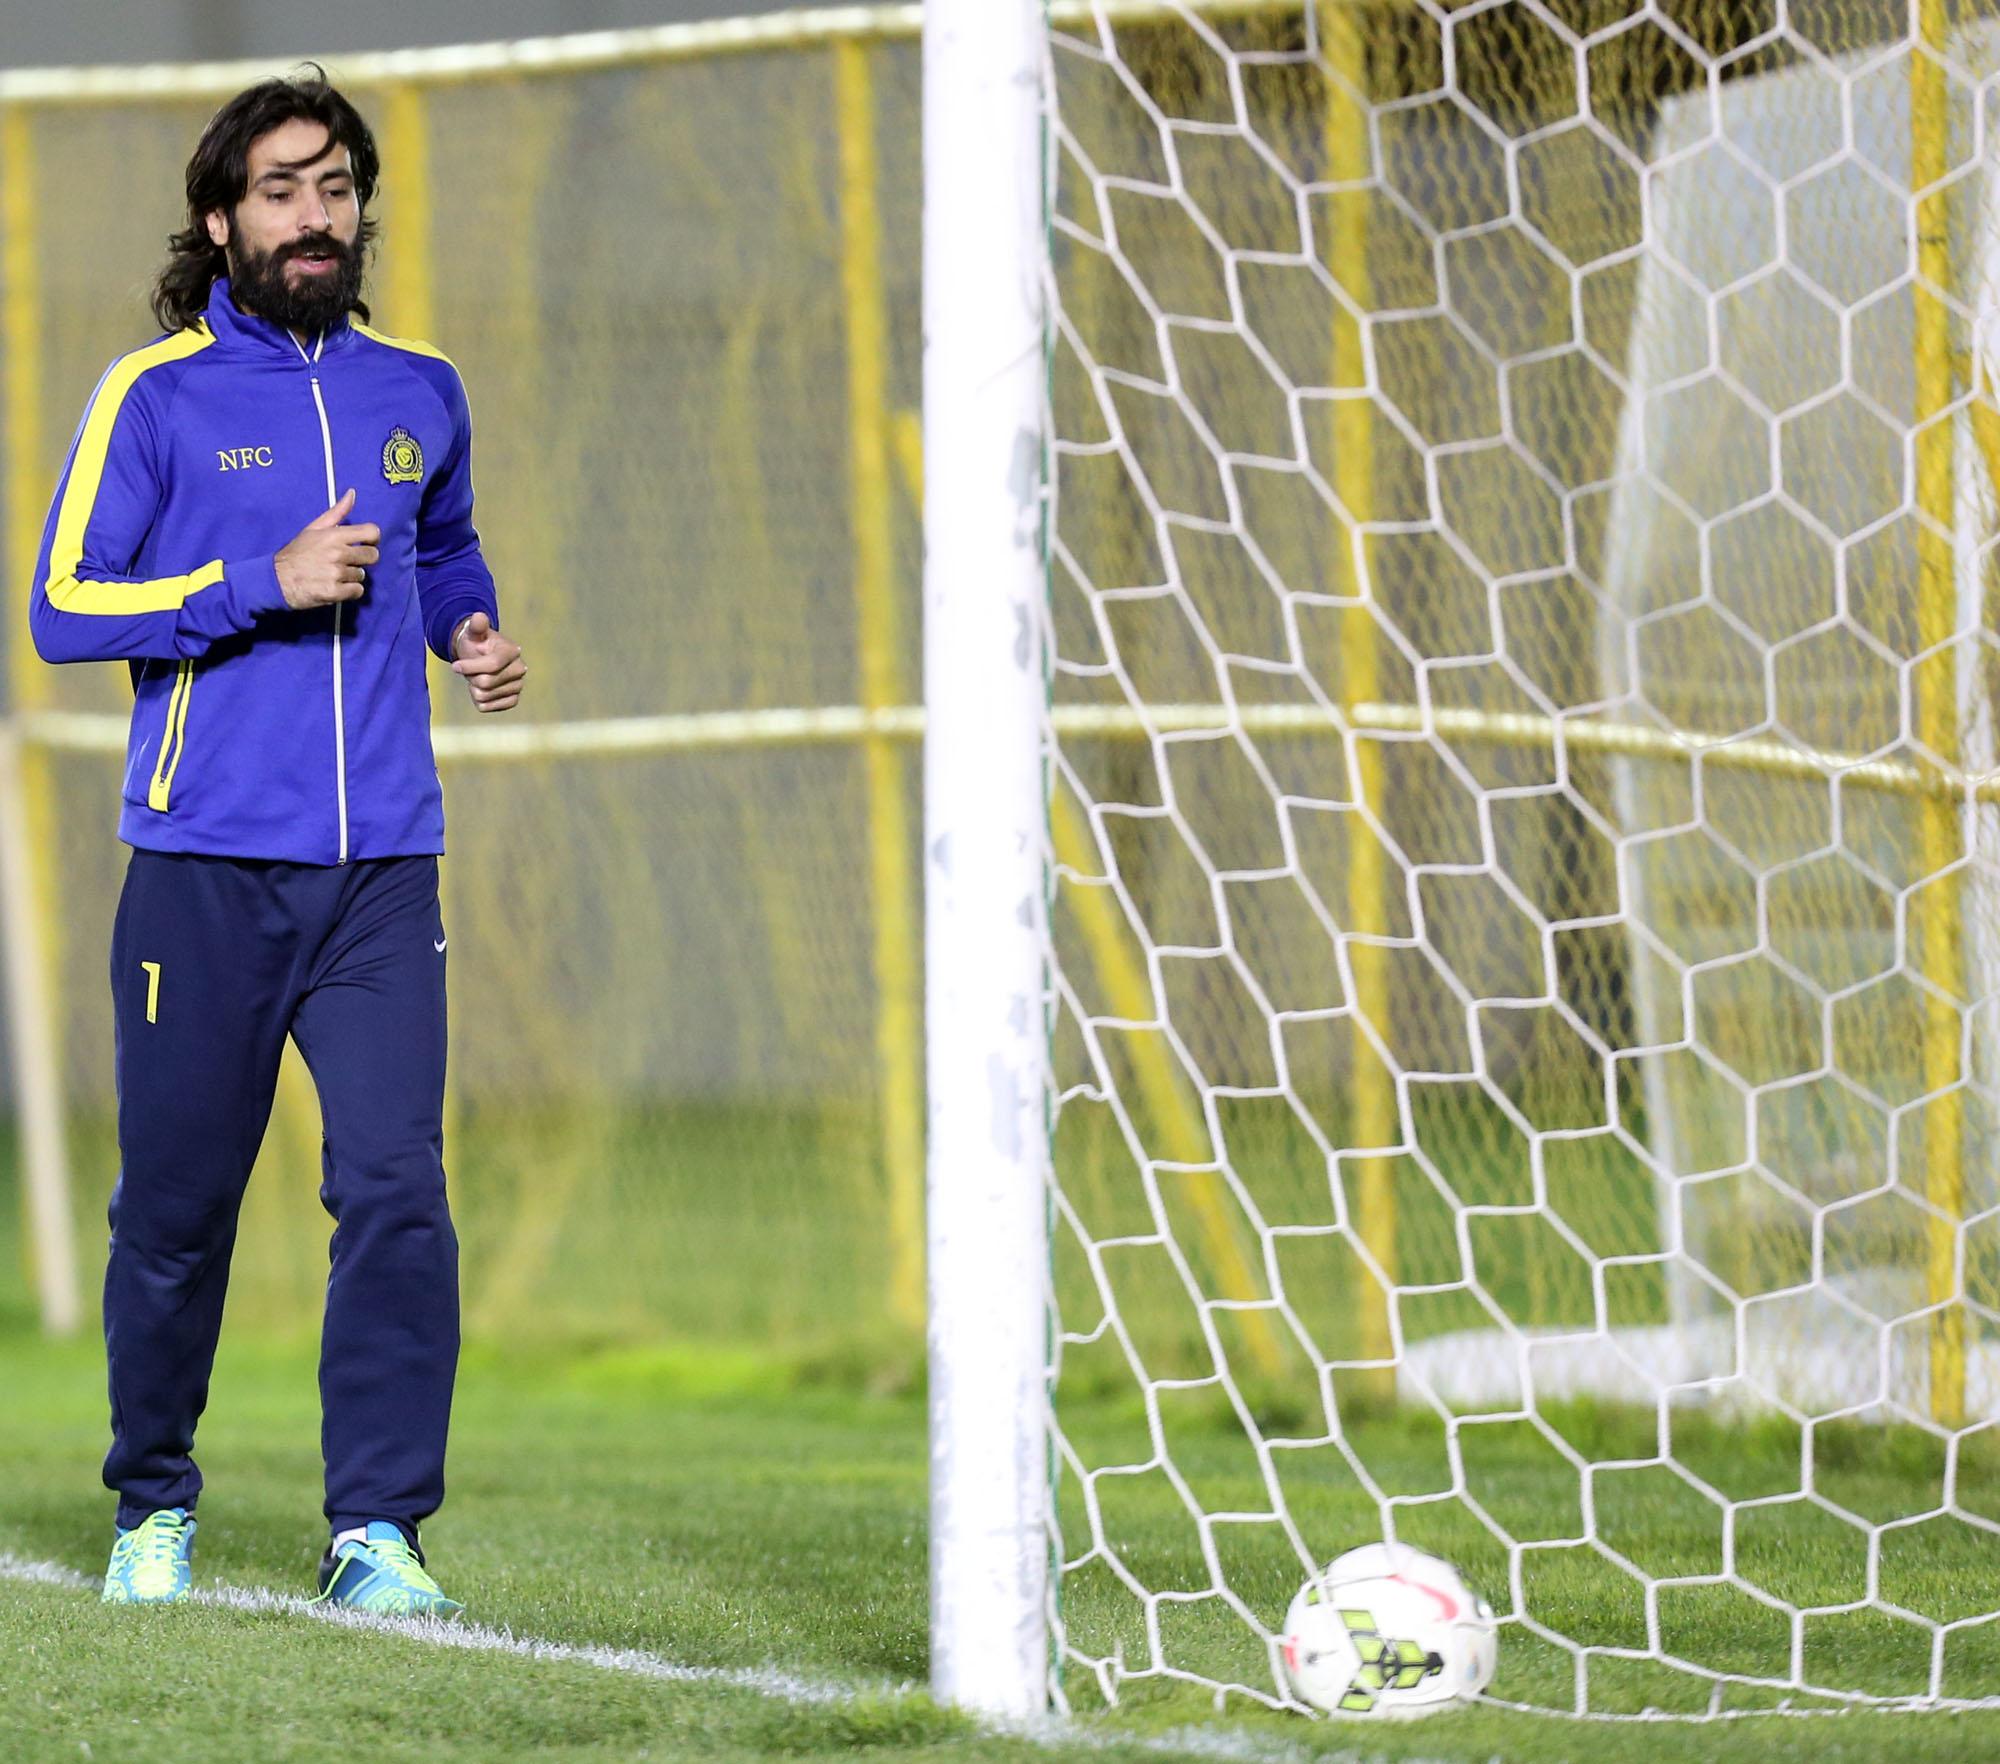 Photo of النصر لـ حسين عبدالغني : شكراً لكل ما قدمته للرياضة السعودية